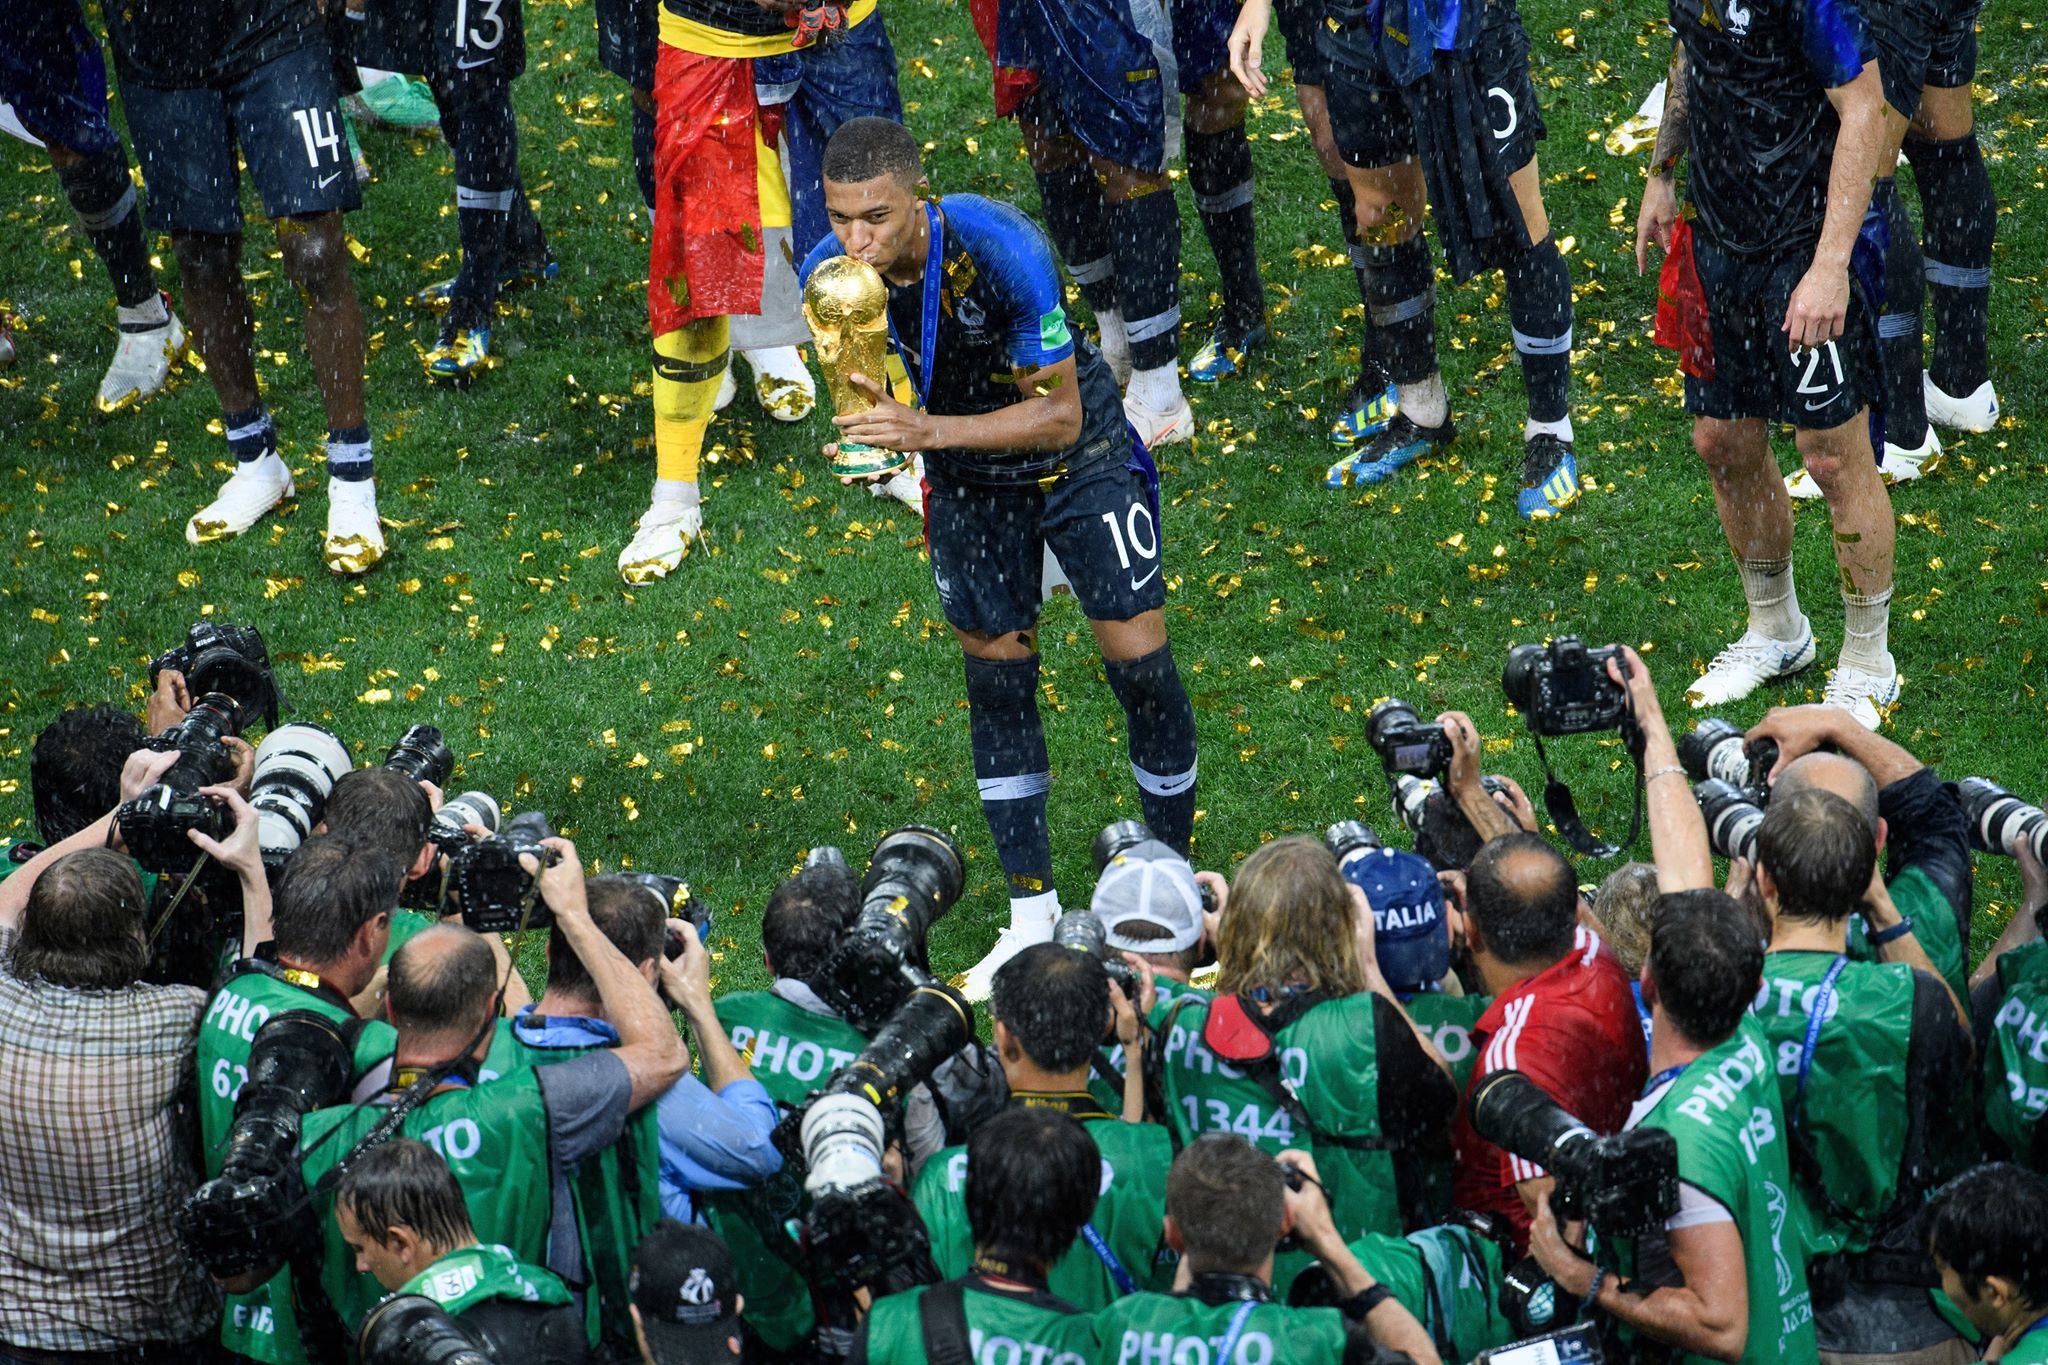 FIFA The Best Awards: Liverpool's Mohamed Salah, Jurgen Klopp Nominated